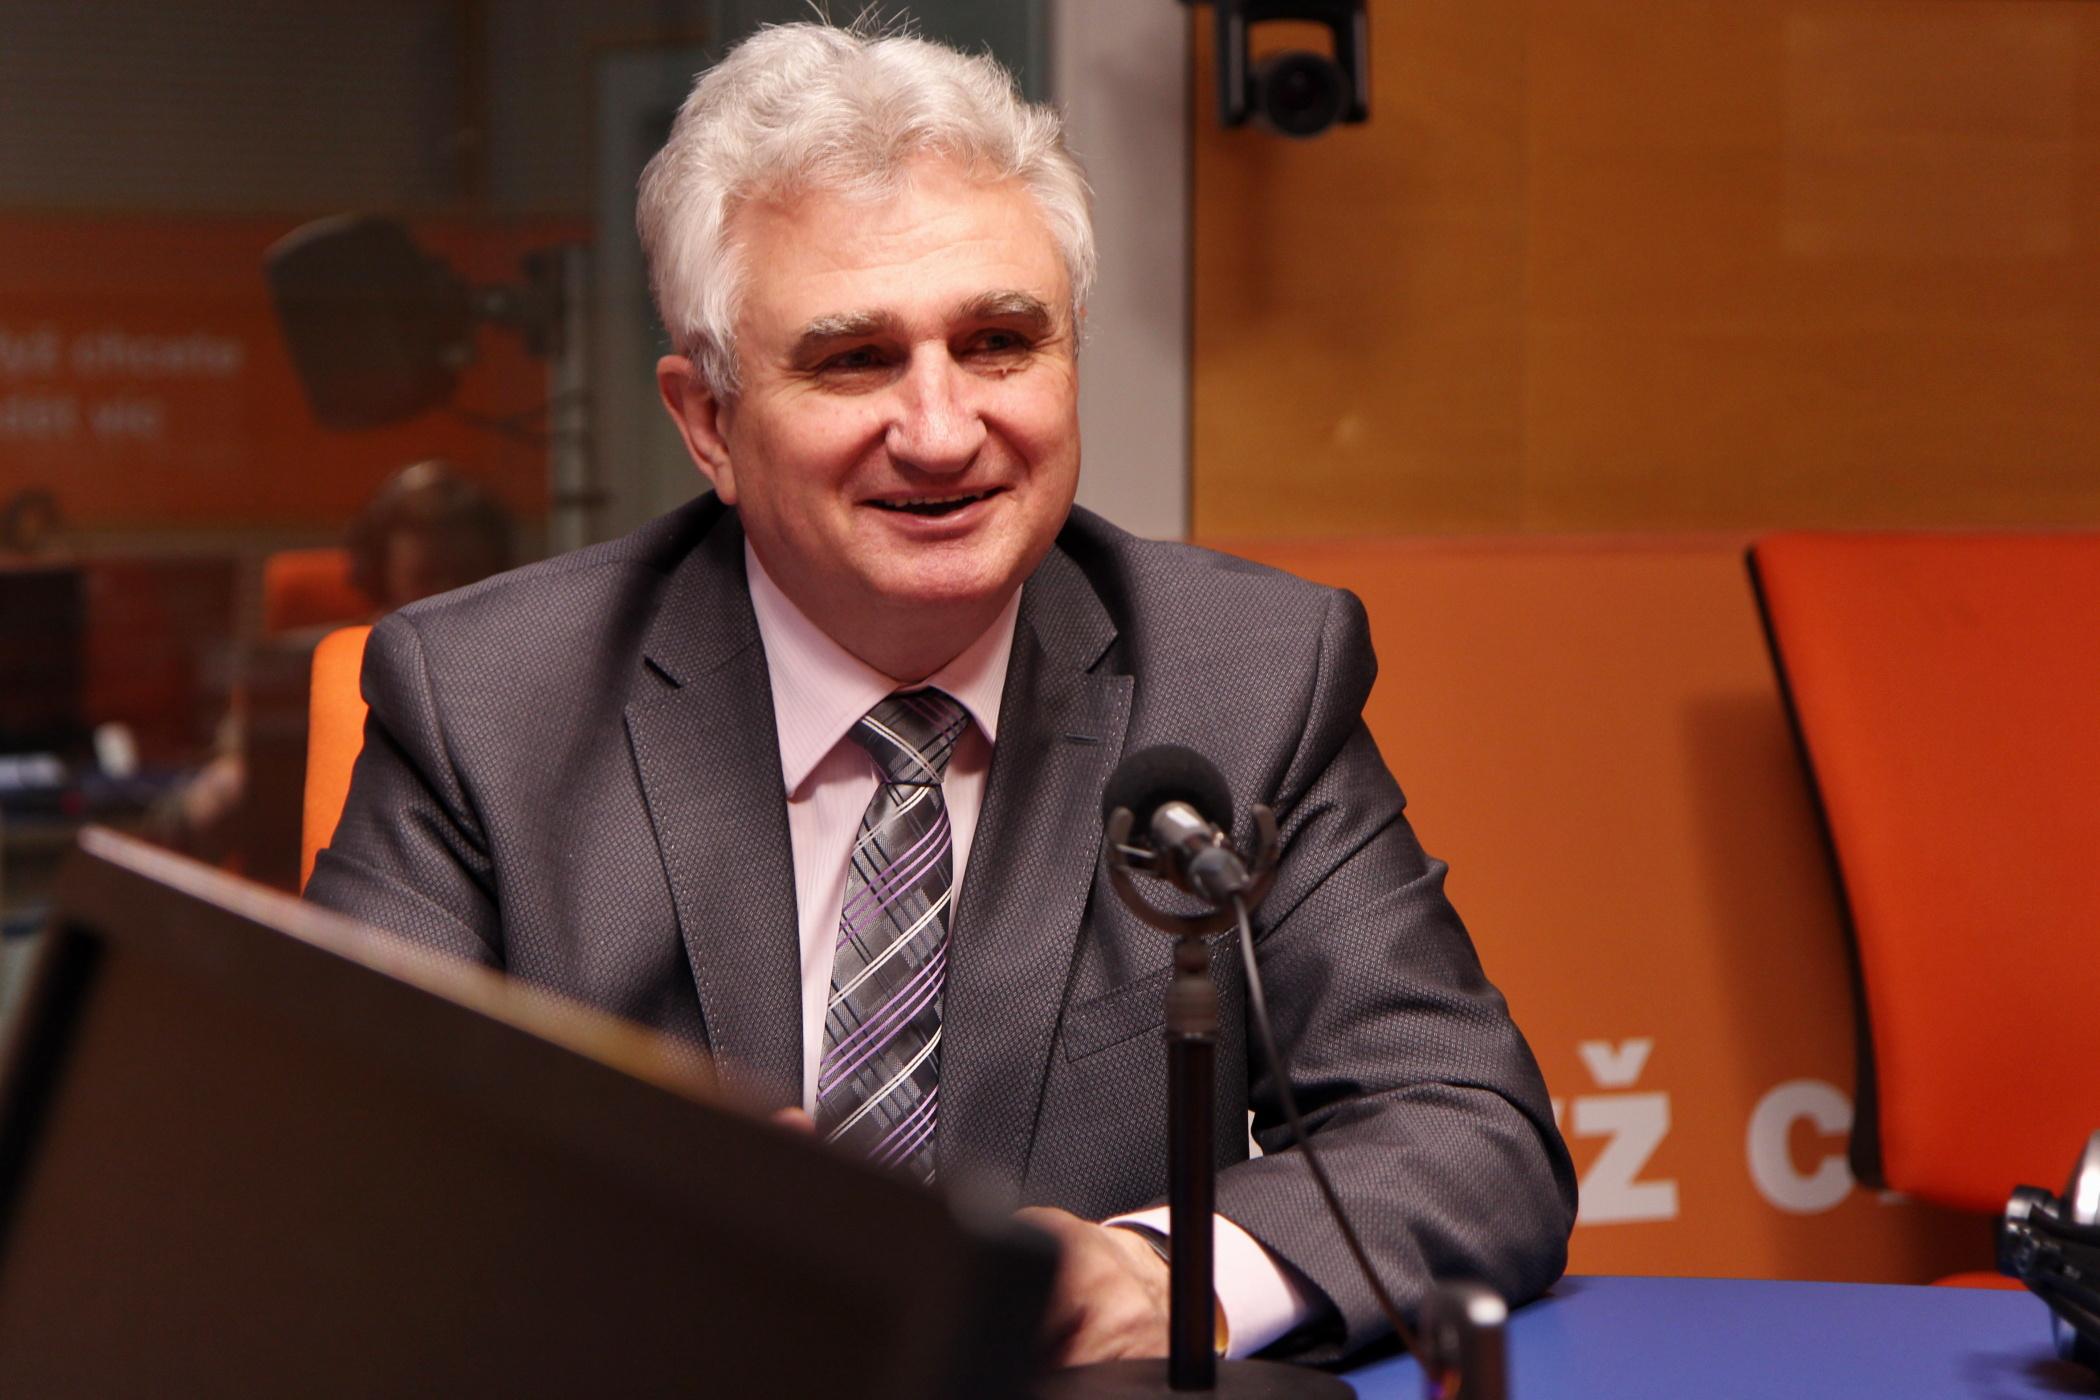 Milan Štěch